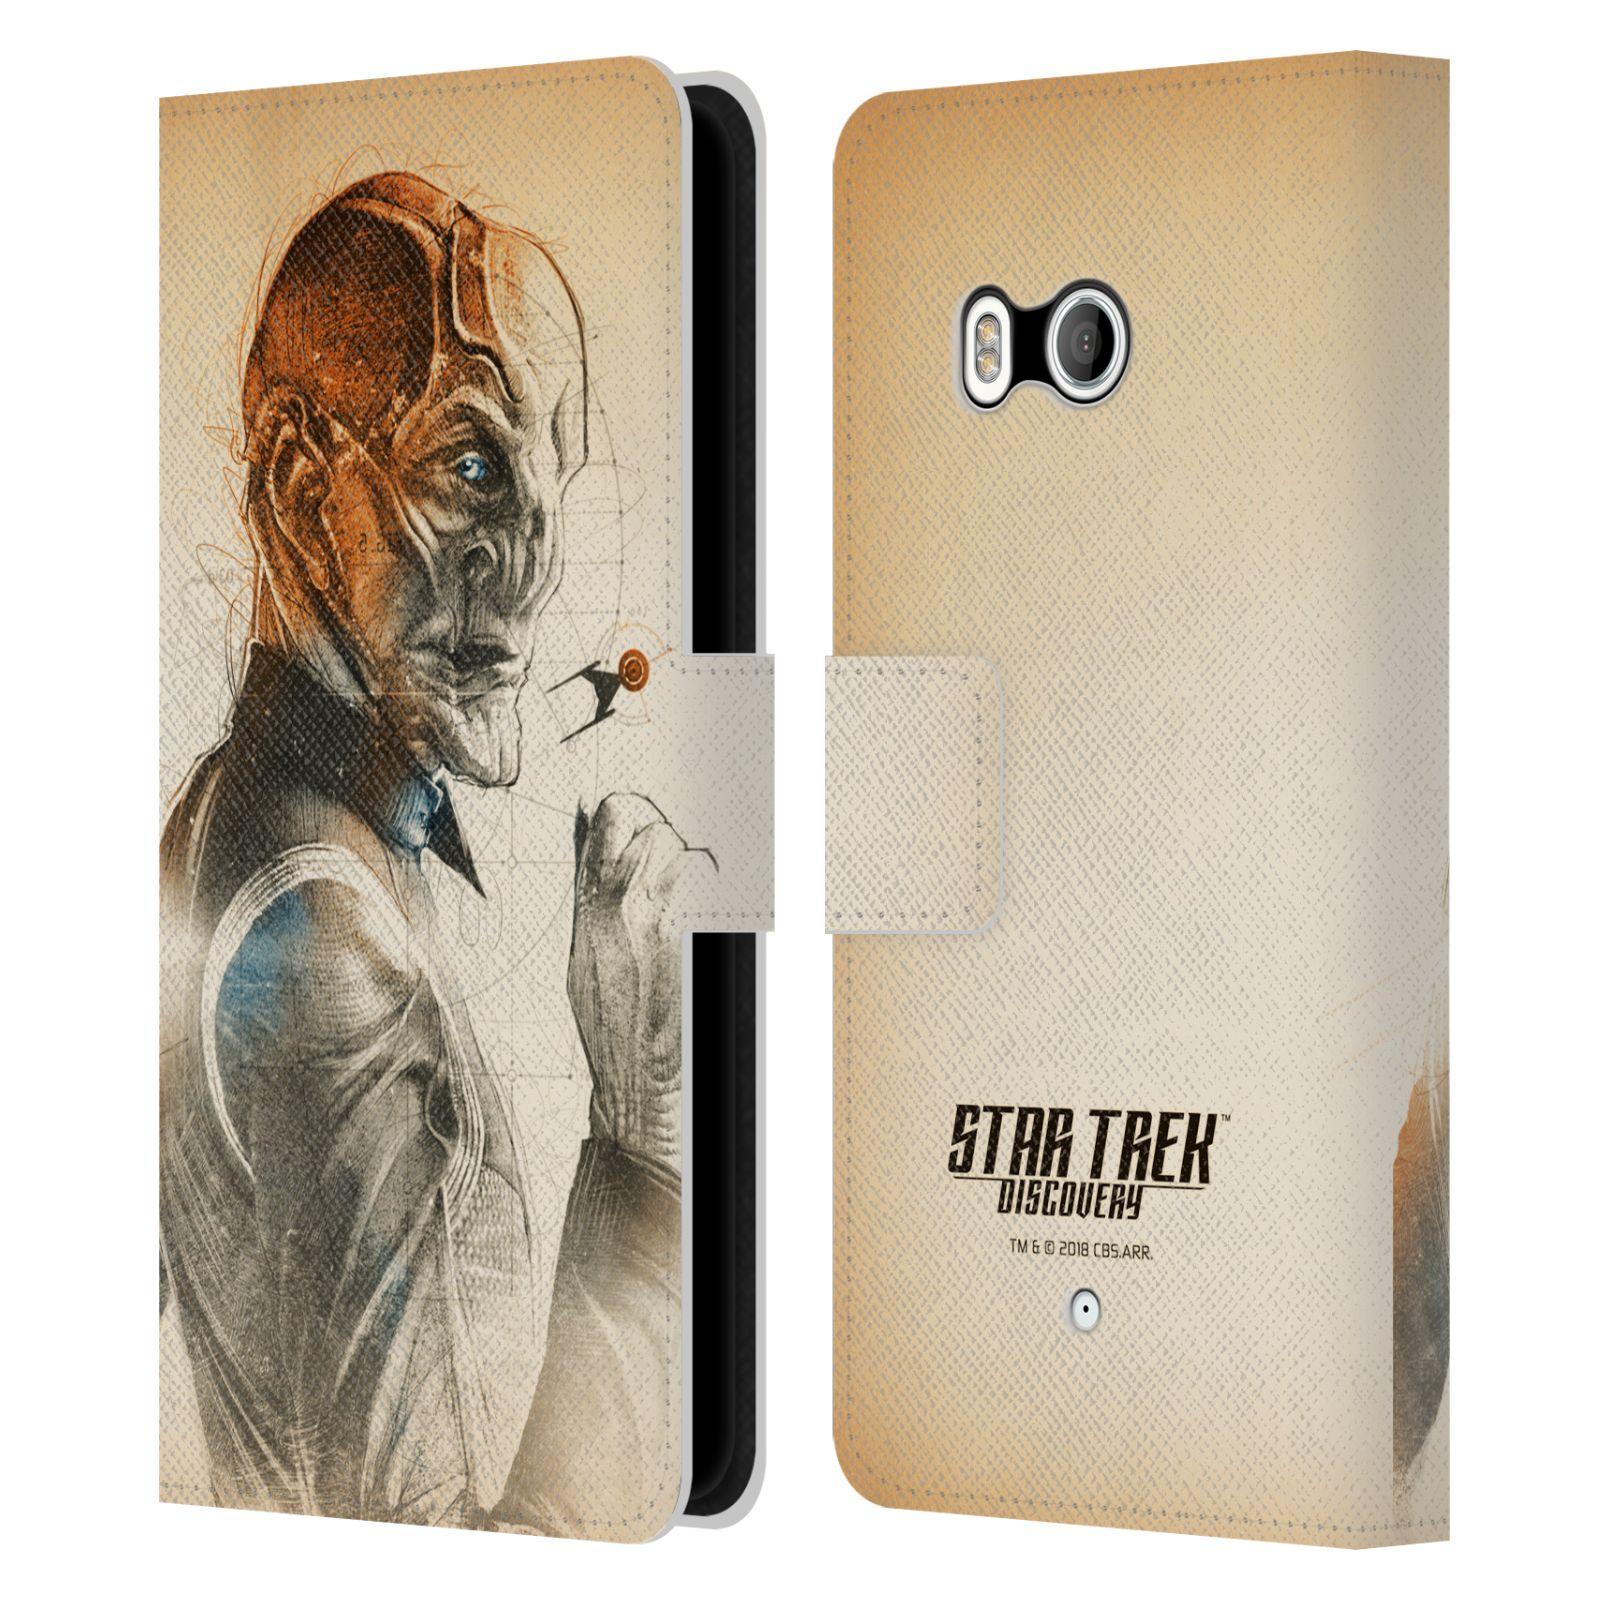 STAR-TREK-DISCOVERY-GRUNGE-PERSONNAGES-ETUI-COQUE-EN-CUIR-POUR-HTC-TELEPHONES-1